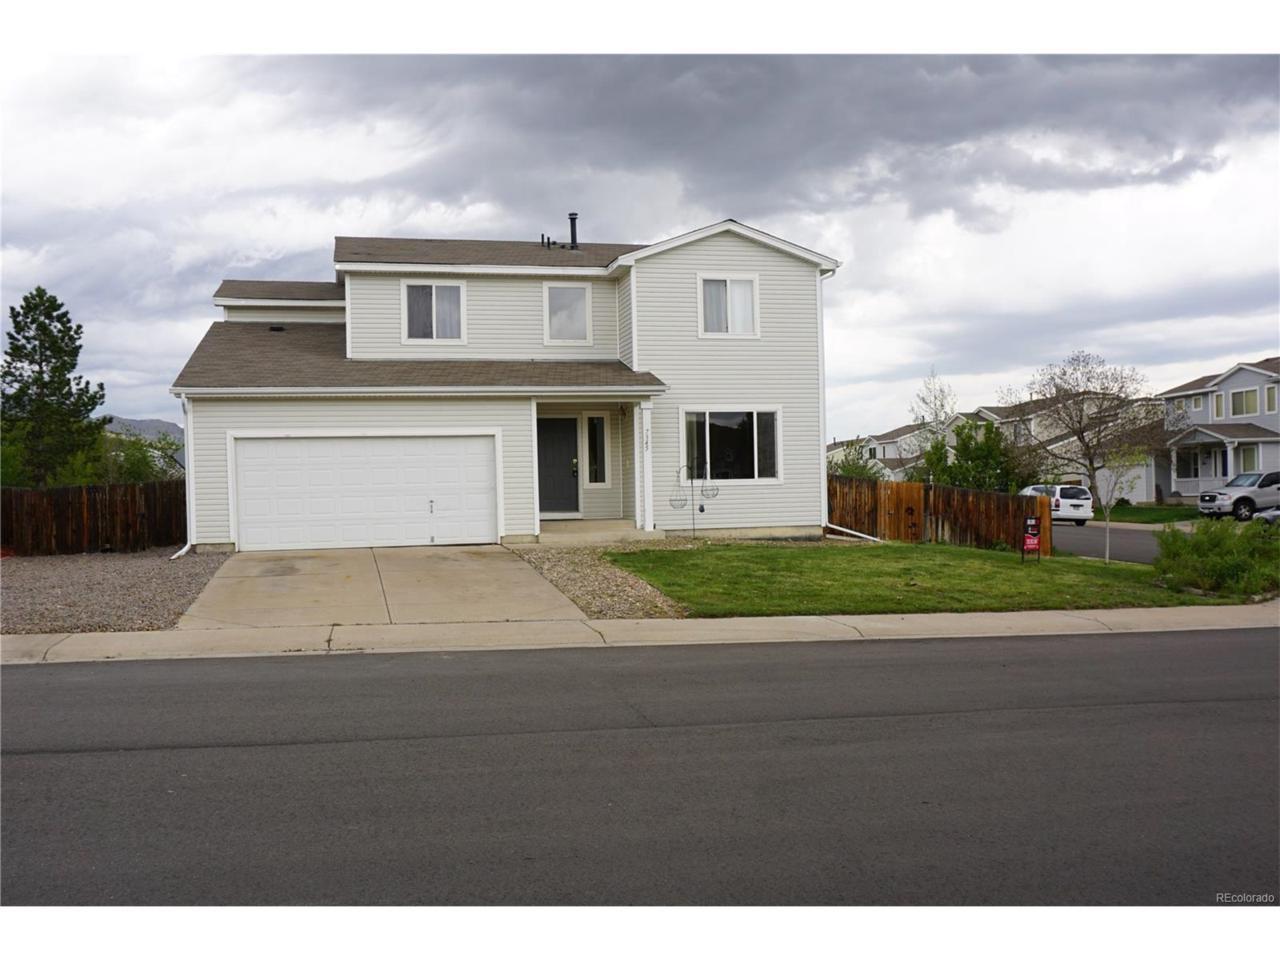 7345 Pine Hills Way, Littleton, CO 80125 (MLS #9136417) :: 8z Real Estate